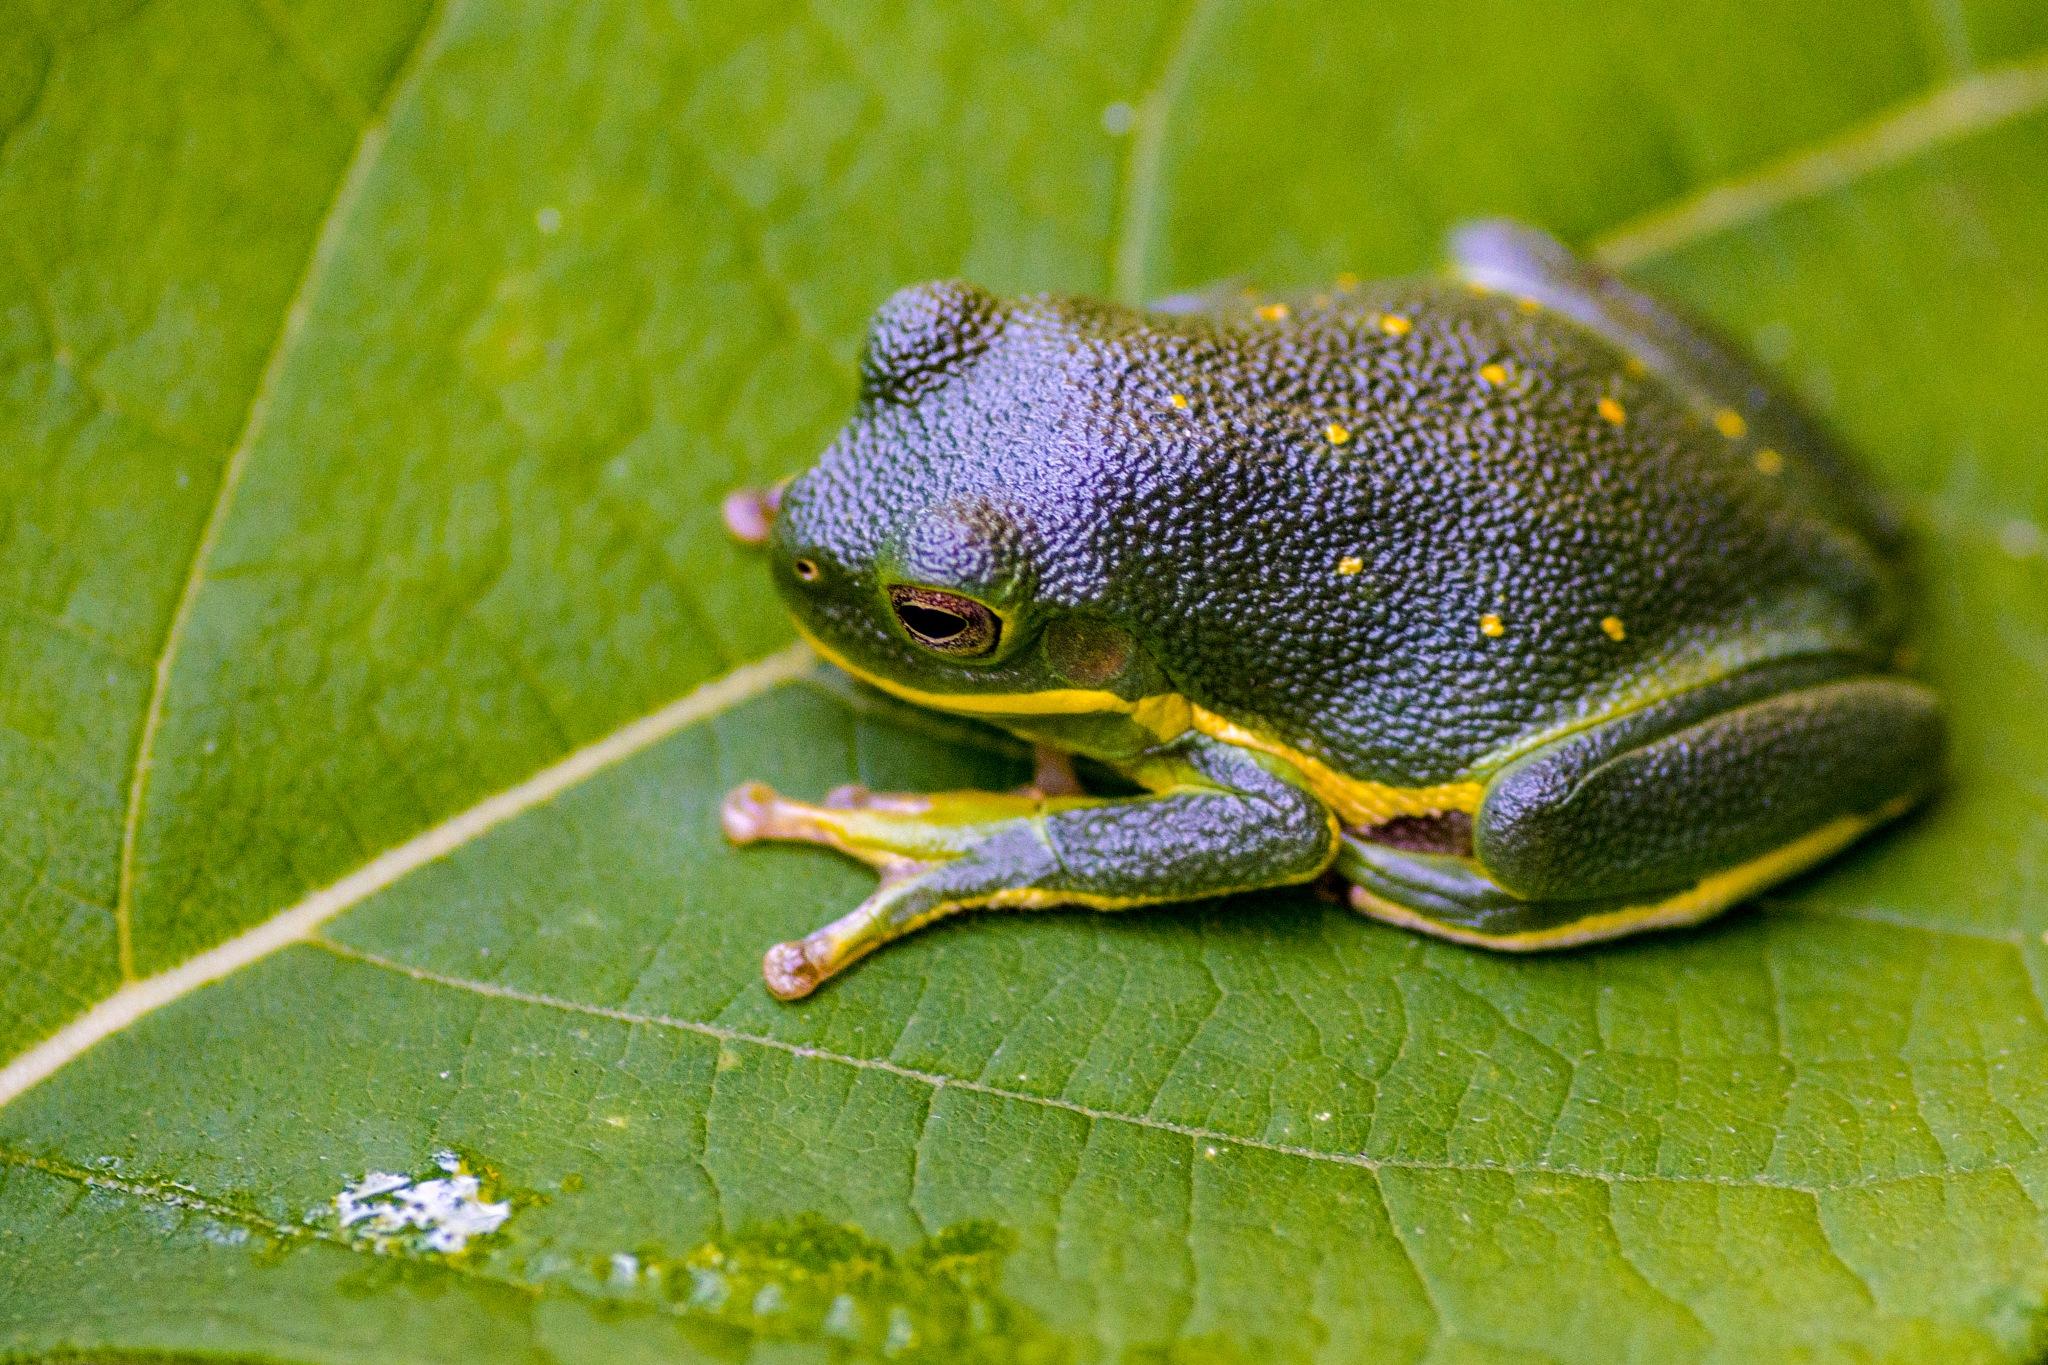 Barking tree frog by Tony Bierman